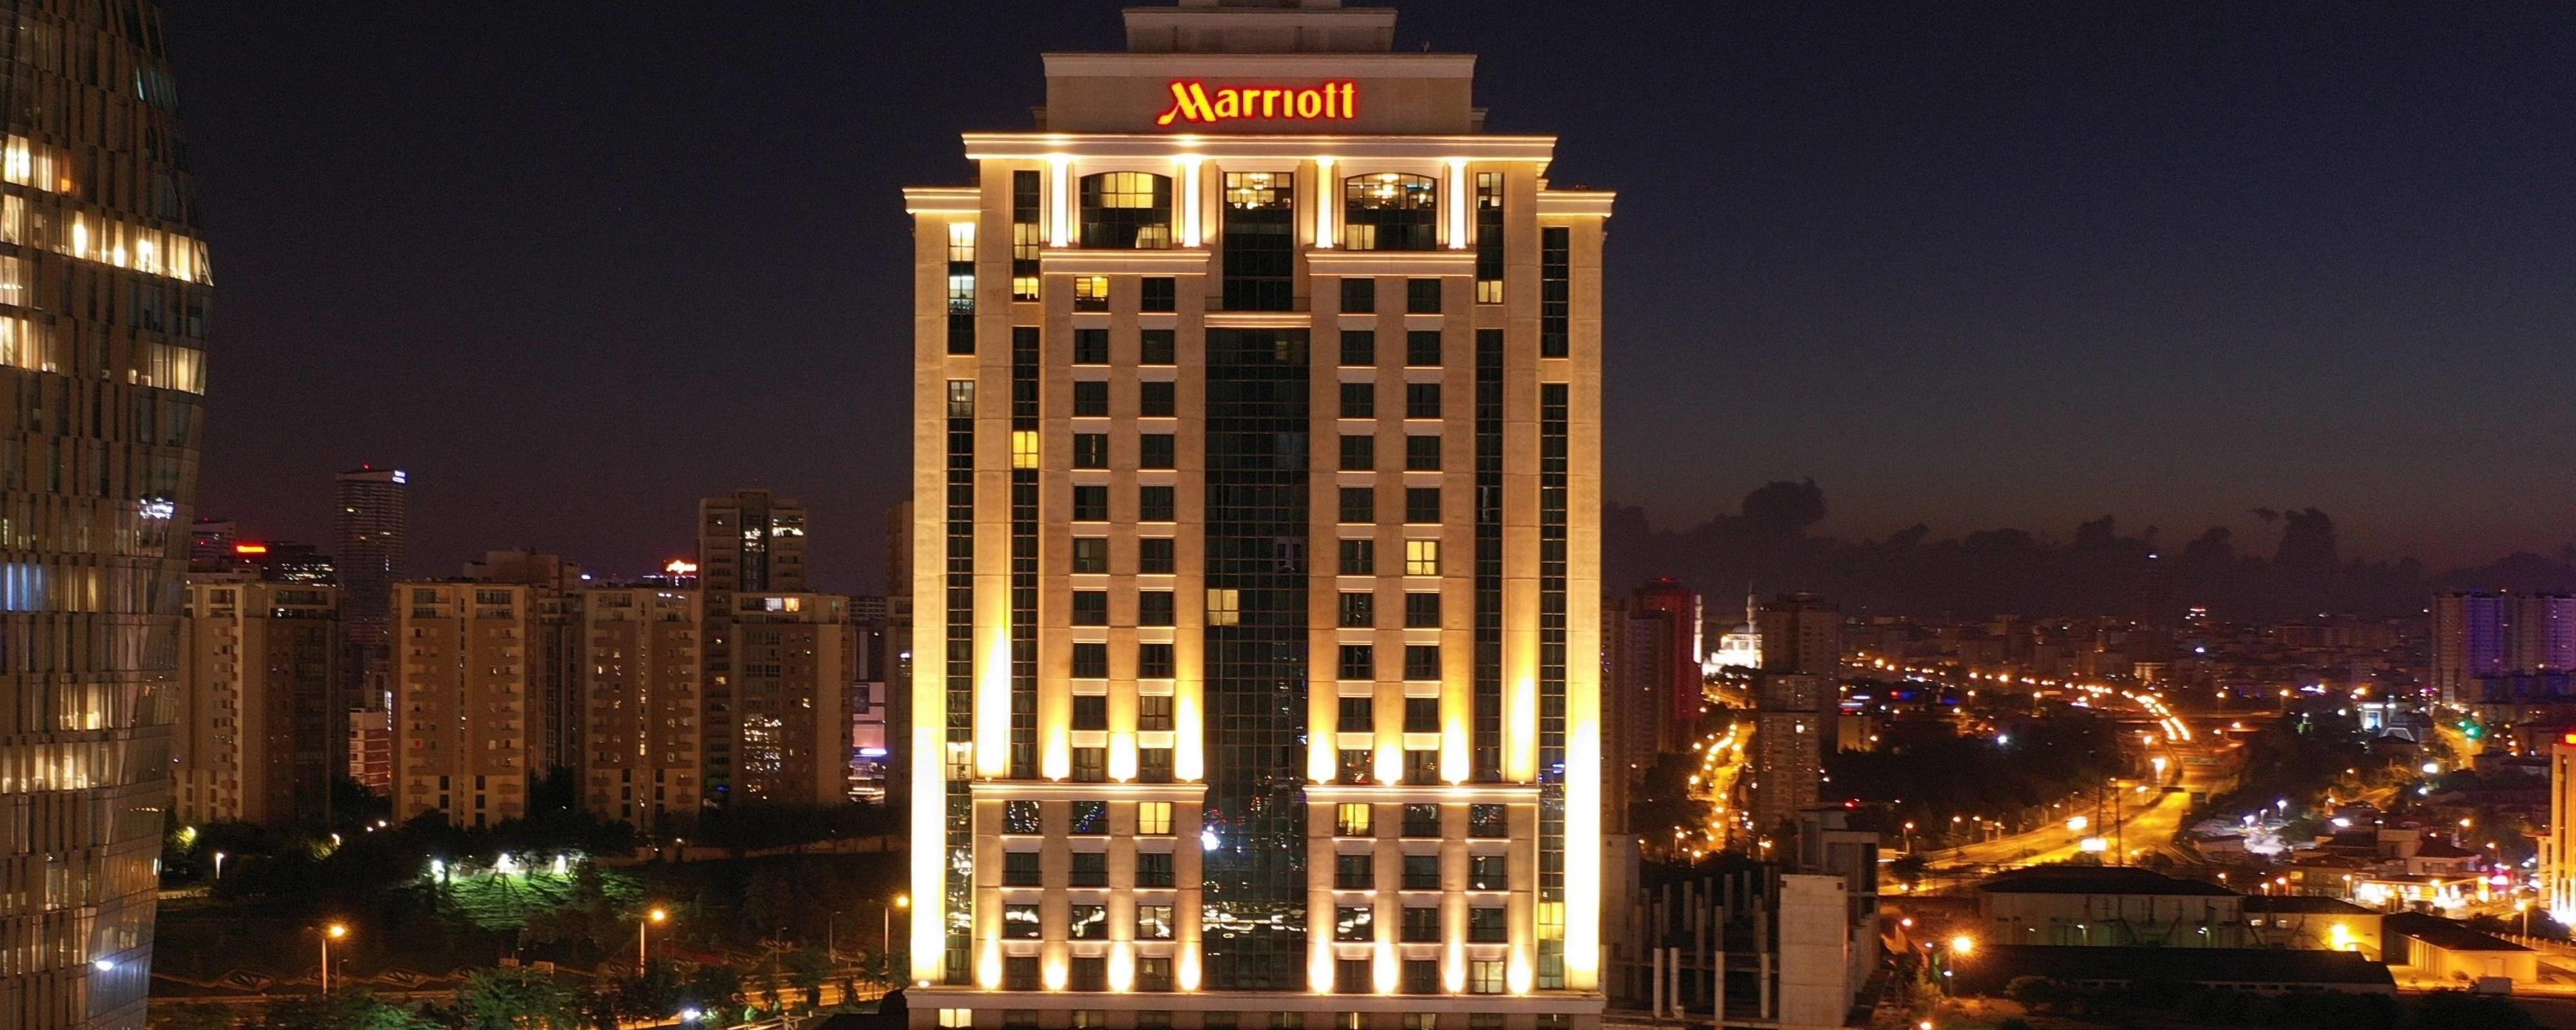 Hotel In Istanbul Istanbul Marriott Hotel Hotel Near